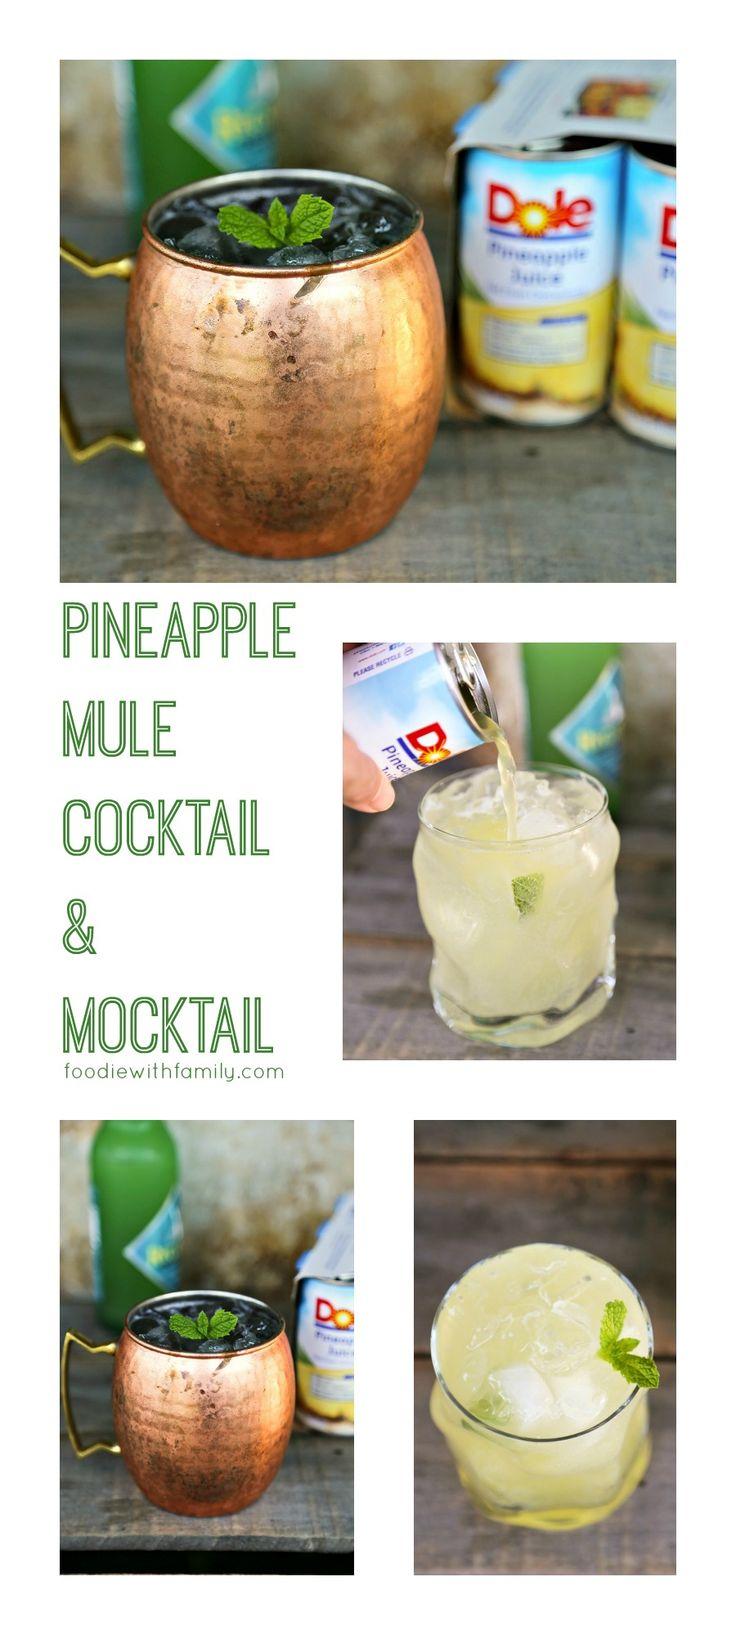 Pineapple Mule Cocktail and Mocktail to please them all #sponsored #KingofJuices